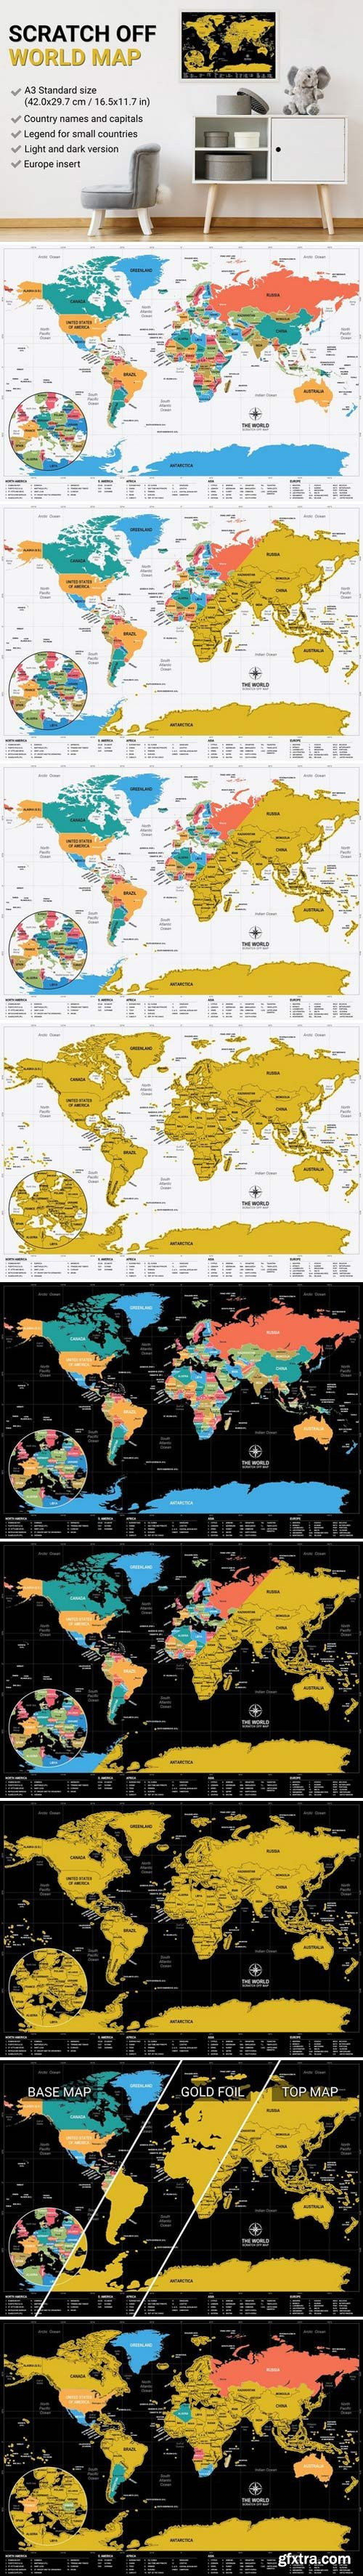 CM - Scratch Off World Map 1834121